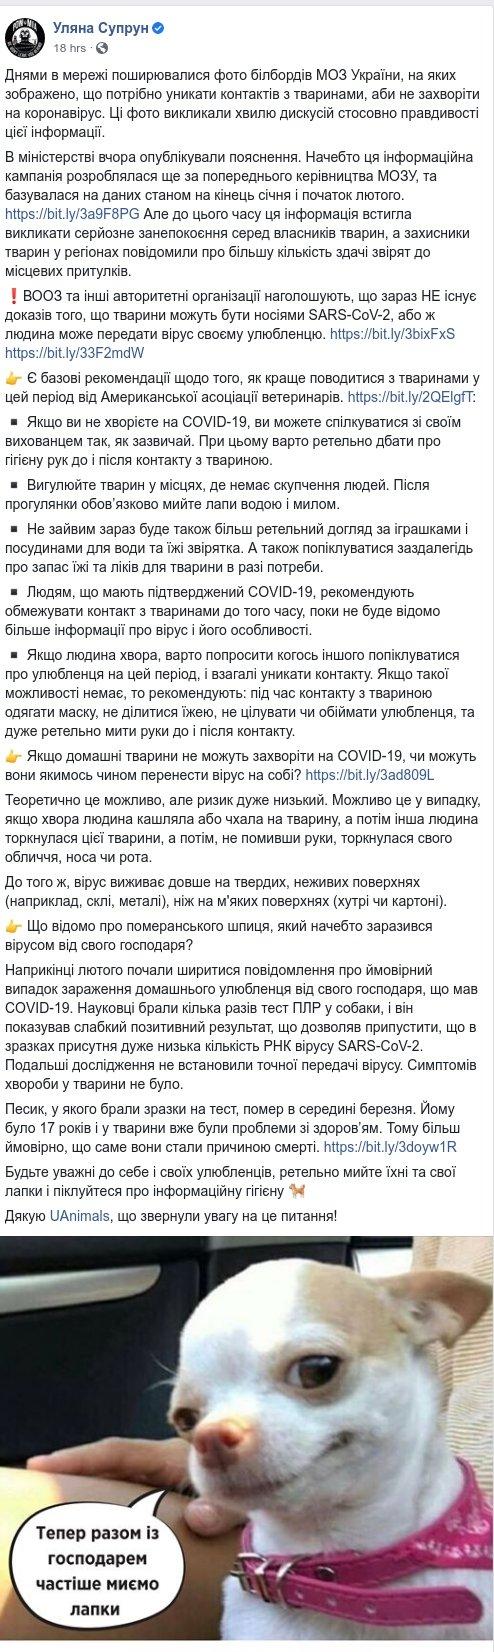 Можно ли заразиться COVID-19 от животных: Супрун четко объяснила